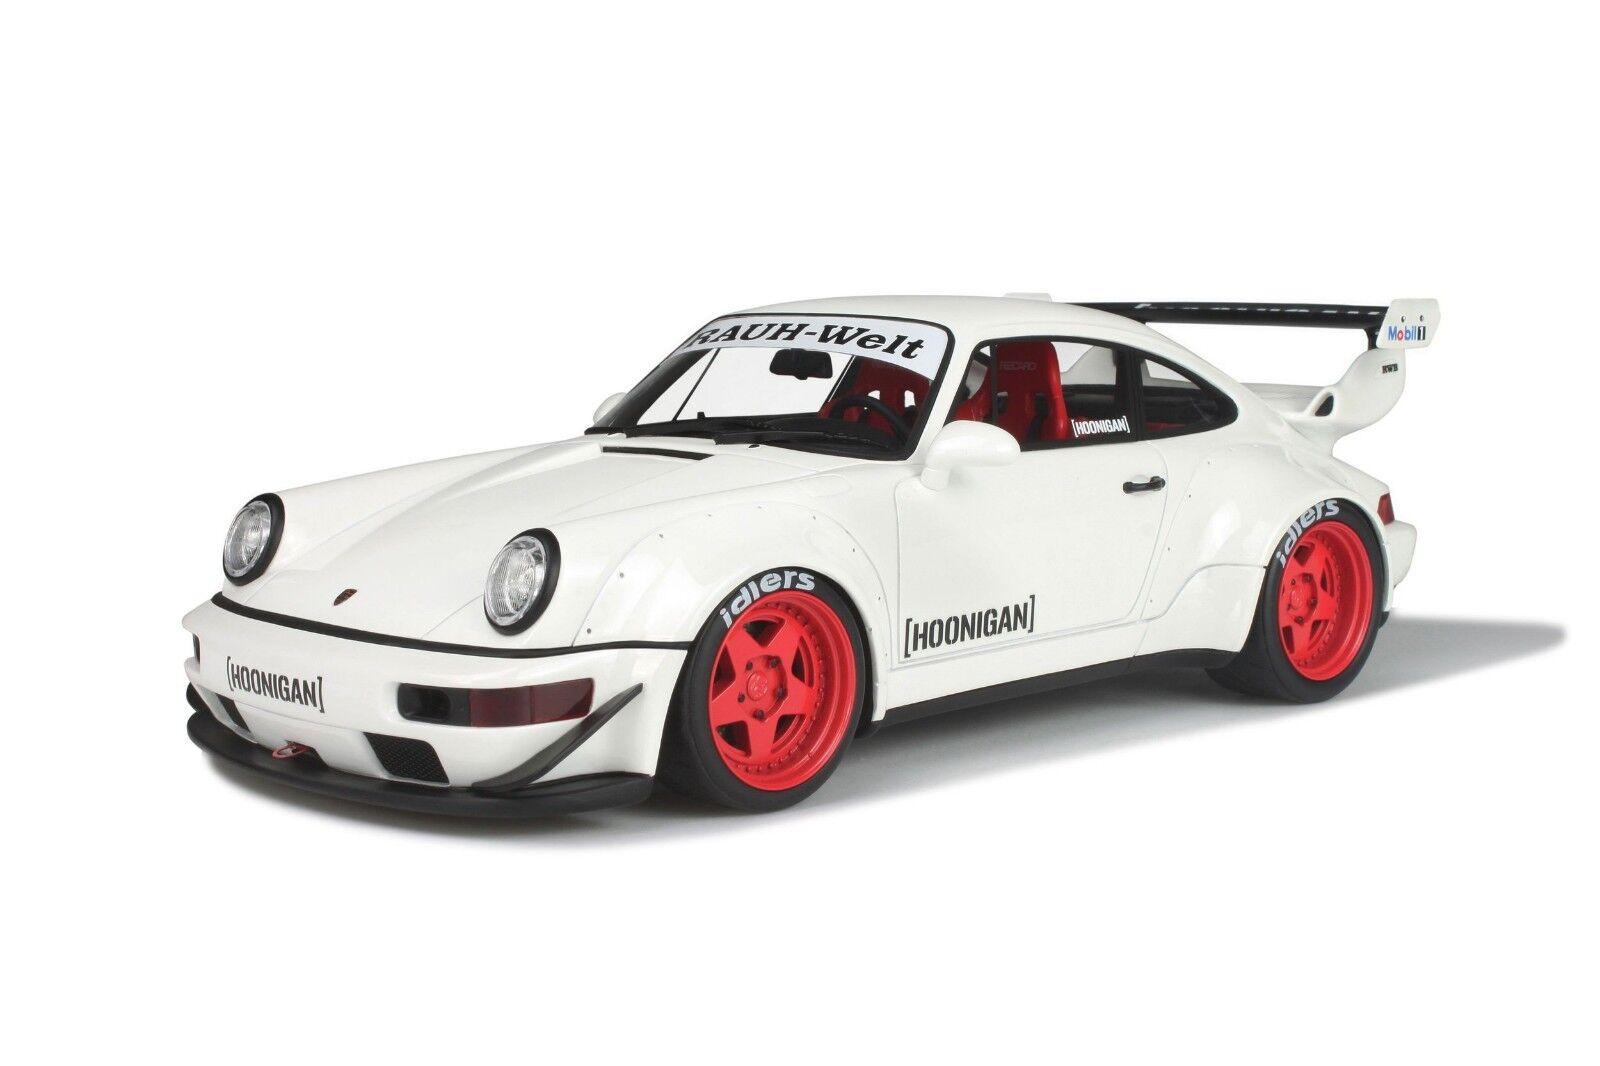 PORSCHE 911 964 Coupe RS Breitbau RWB Rauh Welt Tuning GT Spirit GT732 1 18